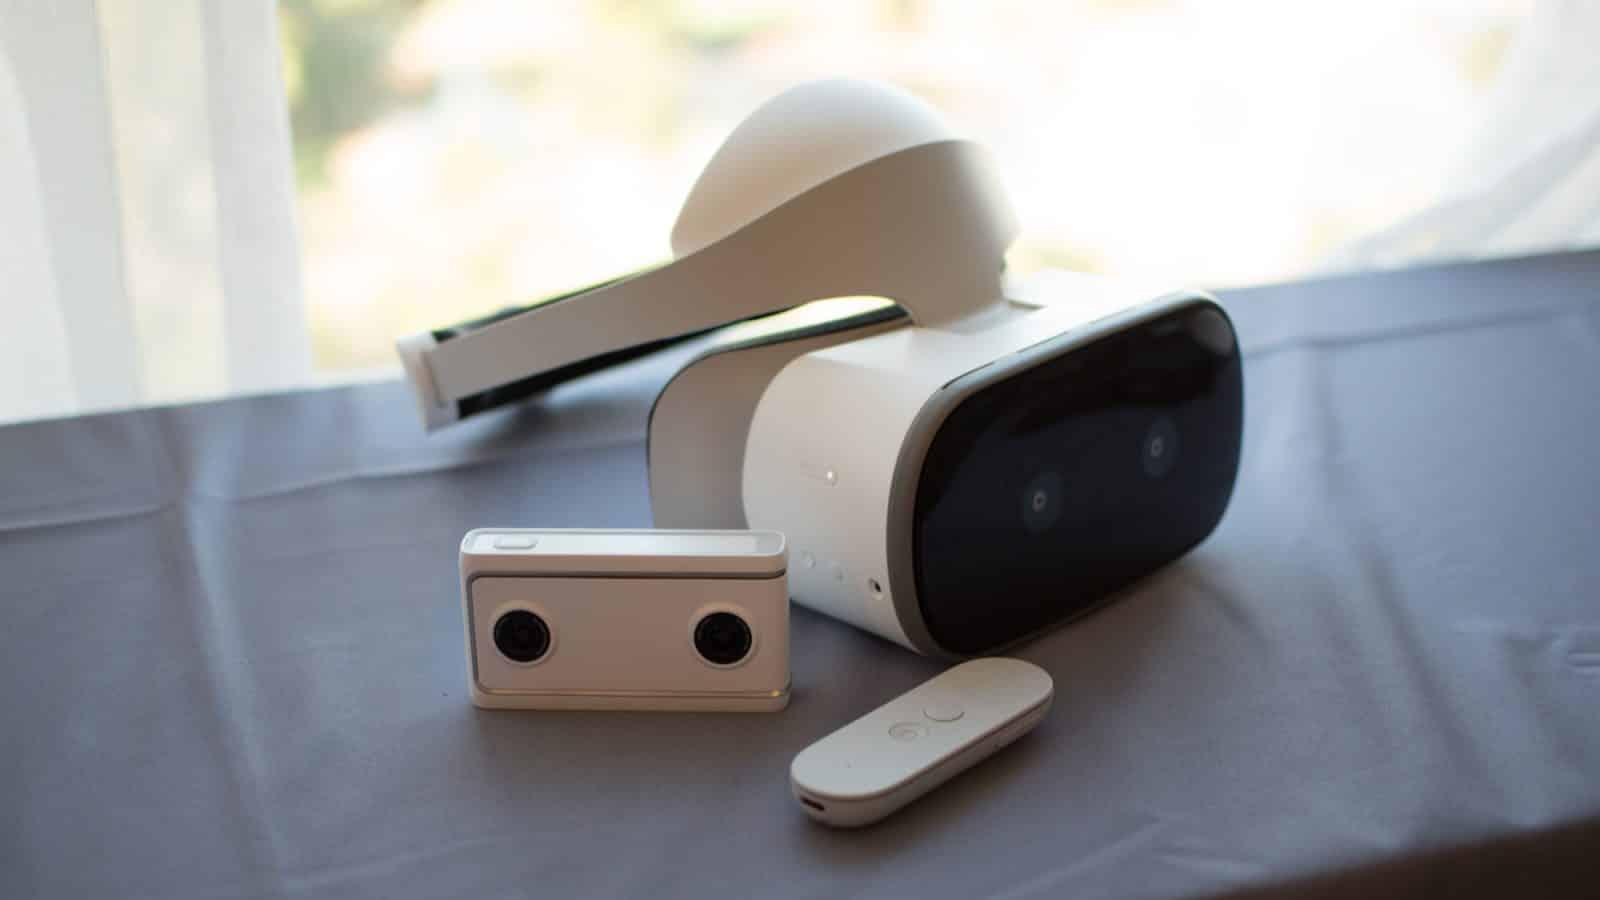 Lenovo Google new Mirage VR headset